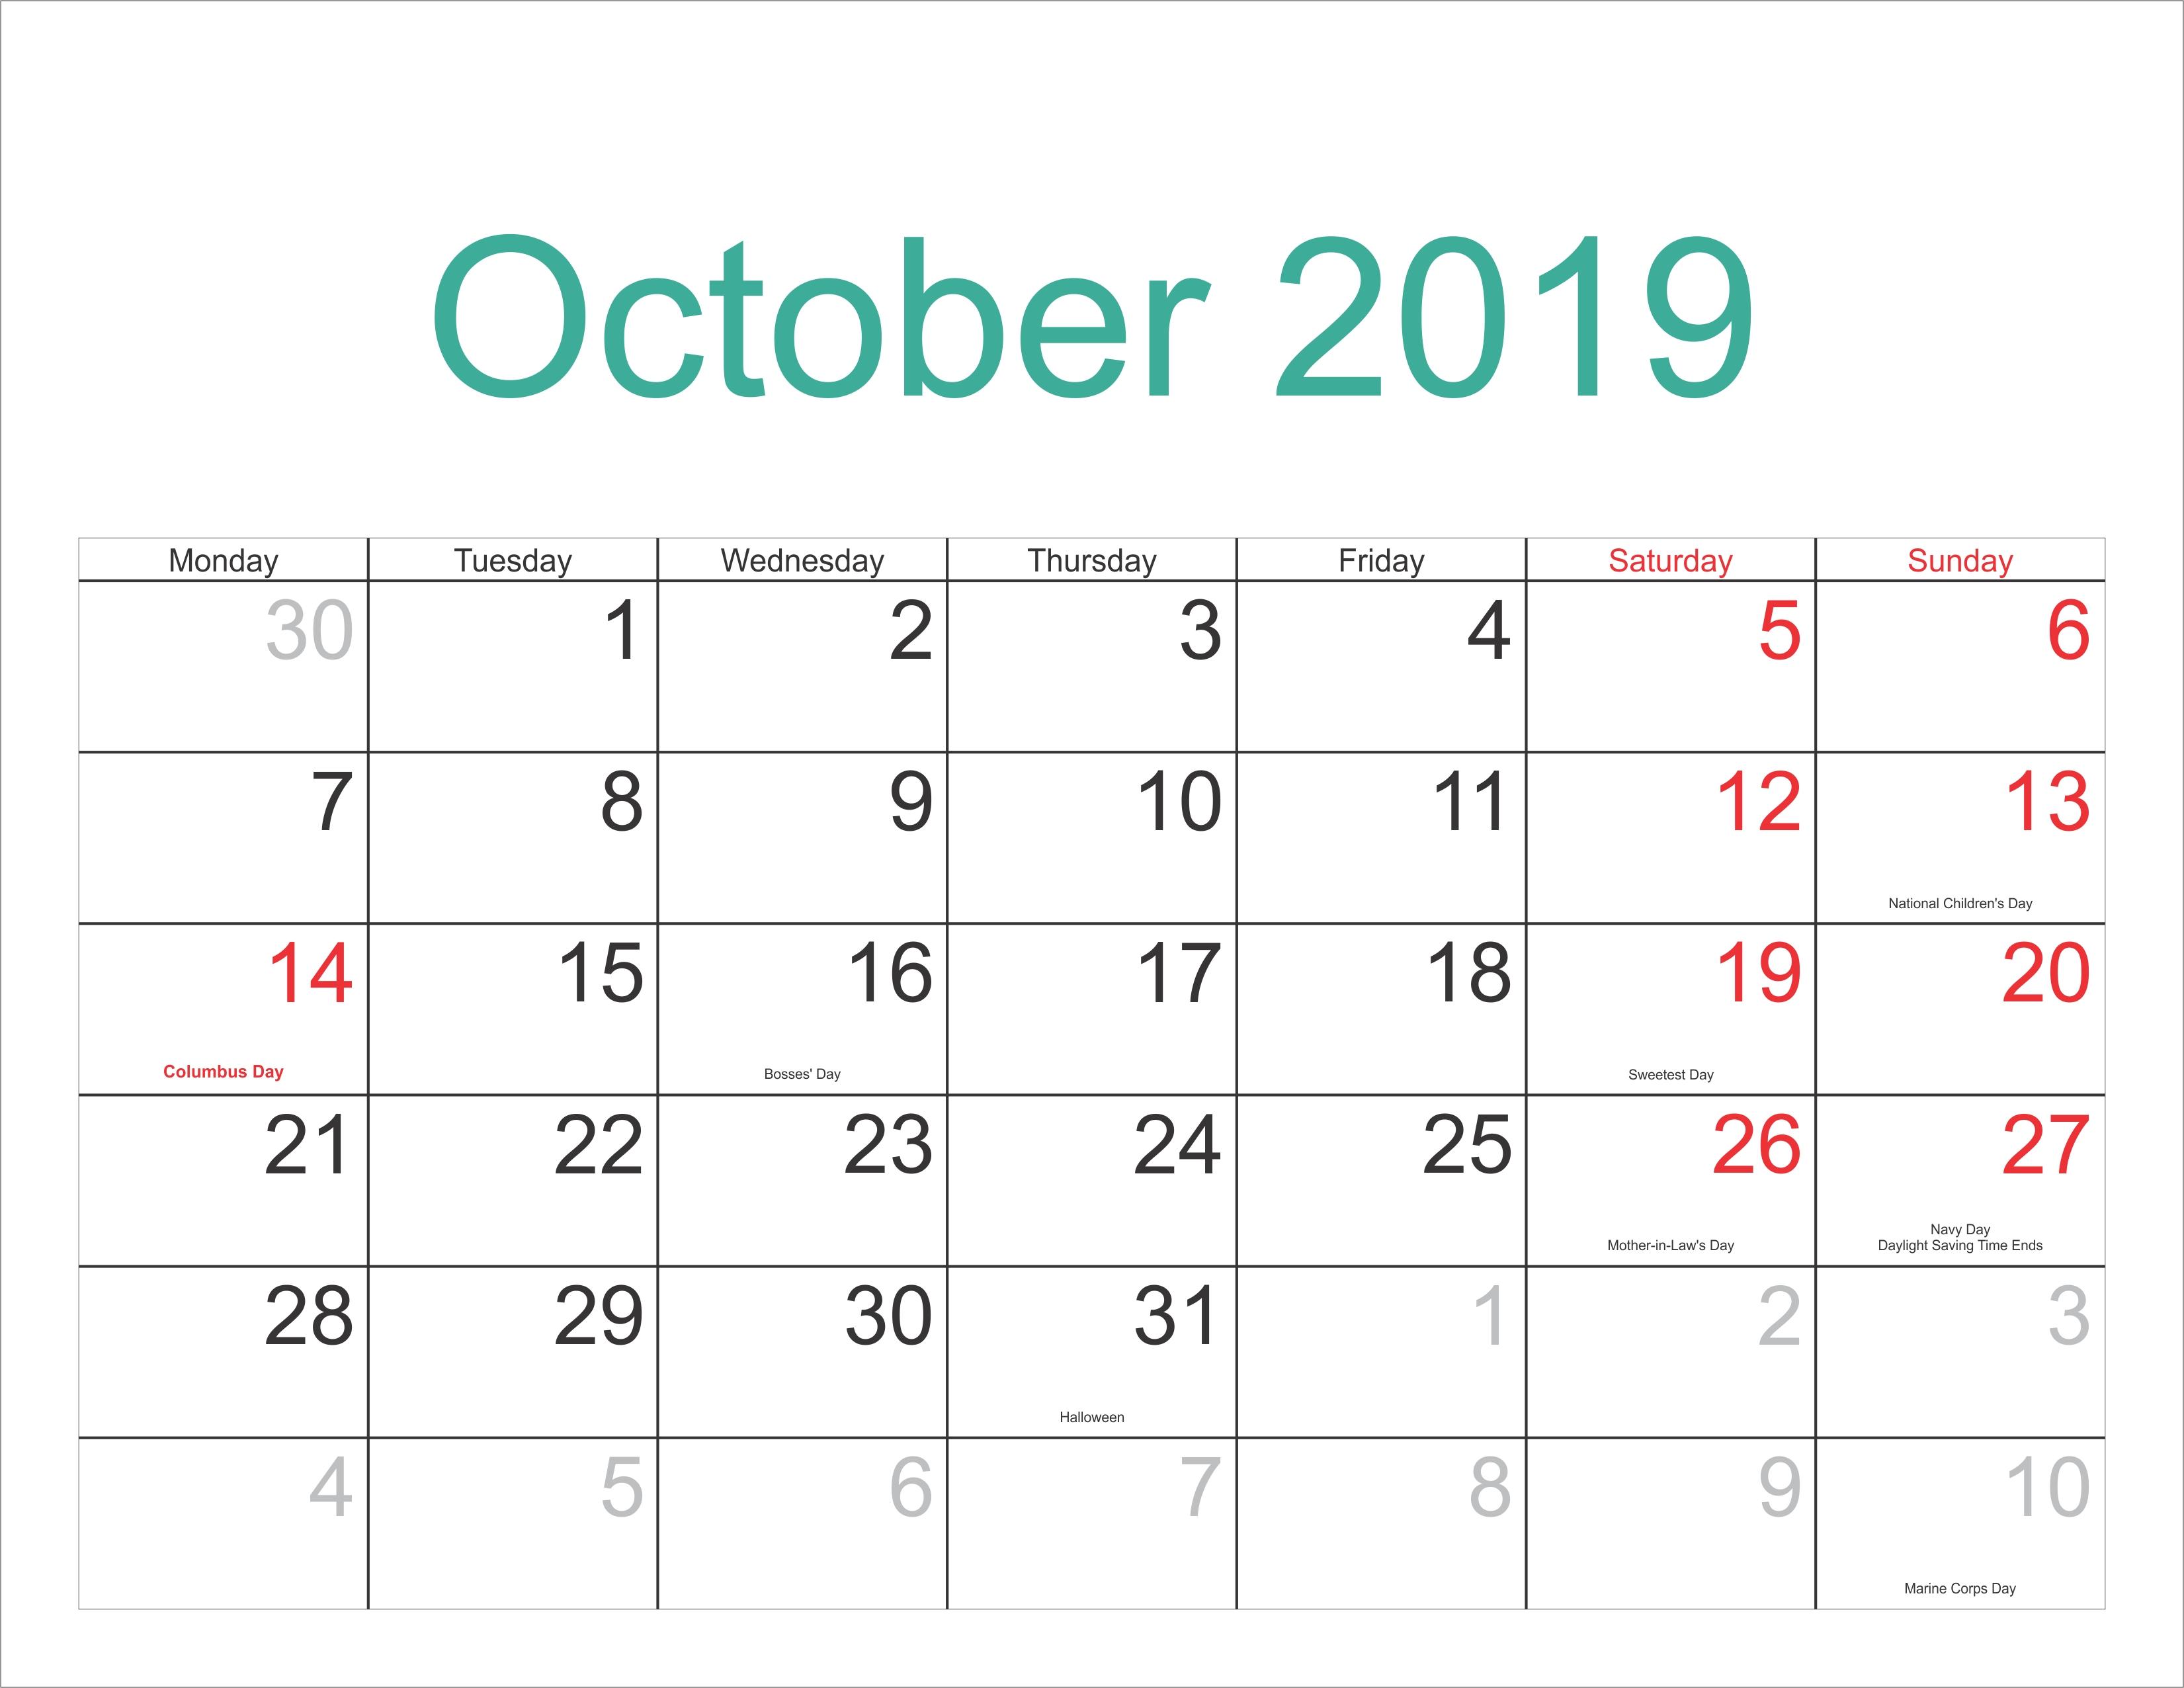 October 2018 Printable Calendar - October 2018 Calendar Template Calendar 2019 Schedule